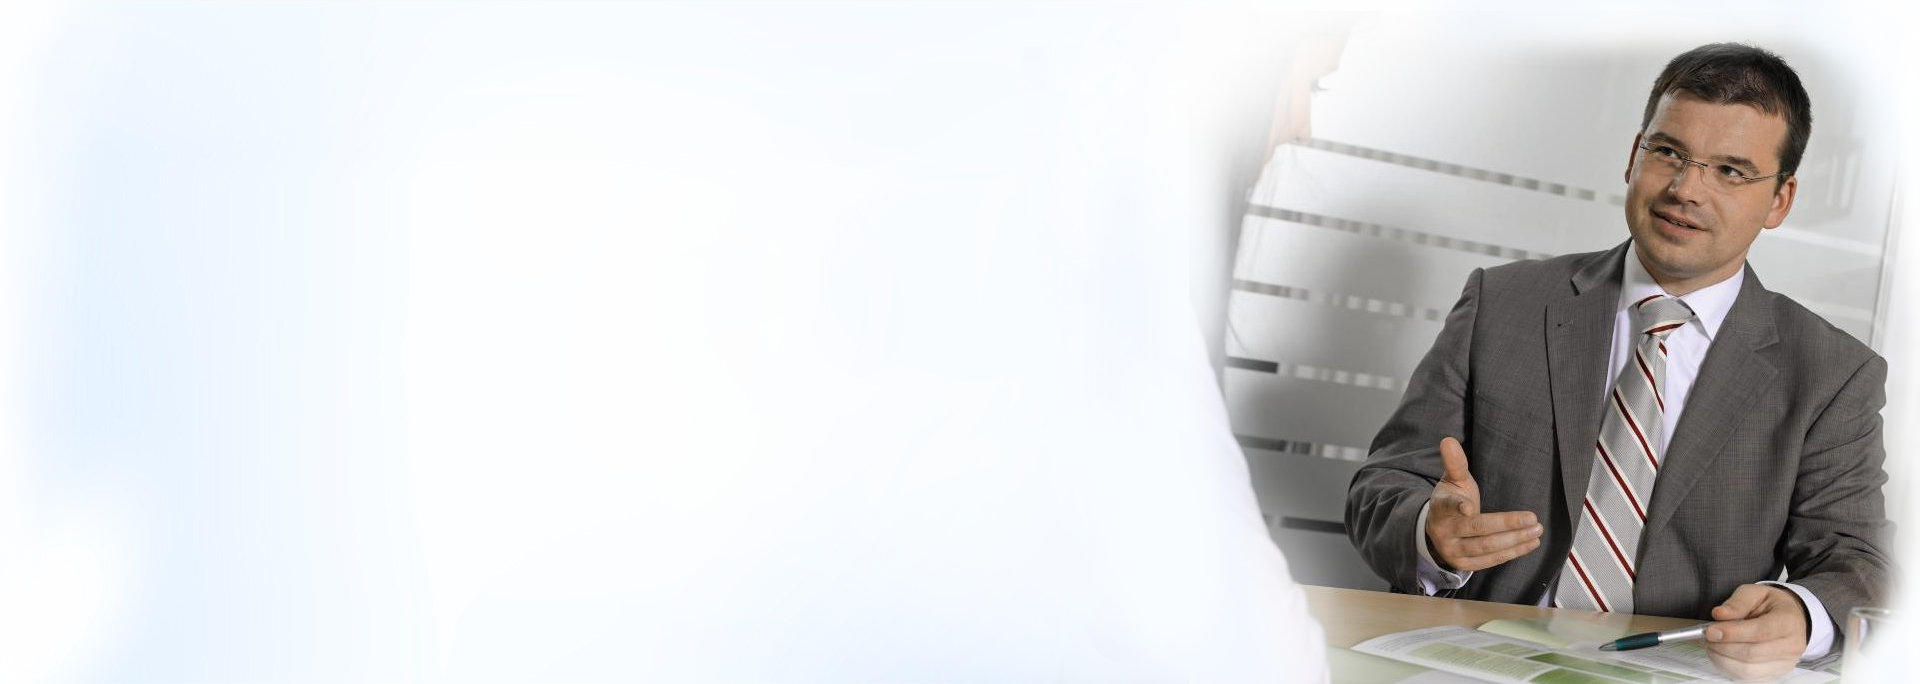 Gewerbeversicherung: individuelle Beratung